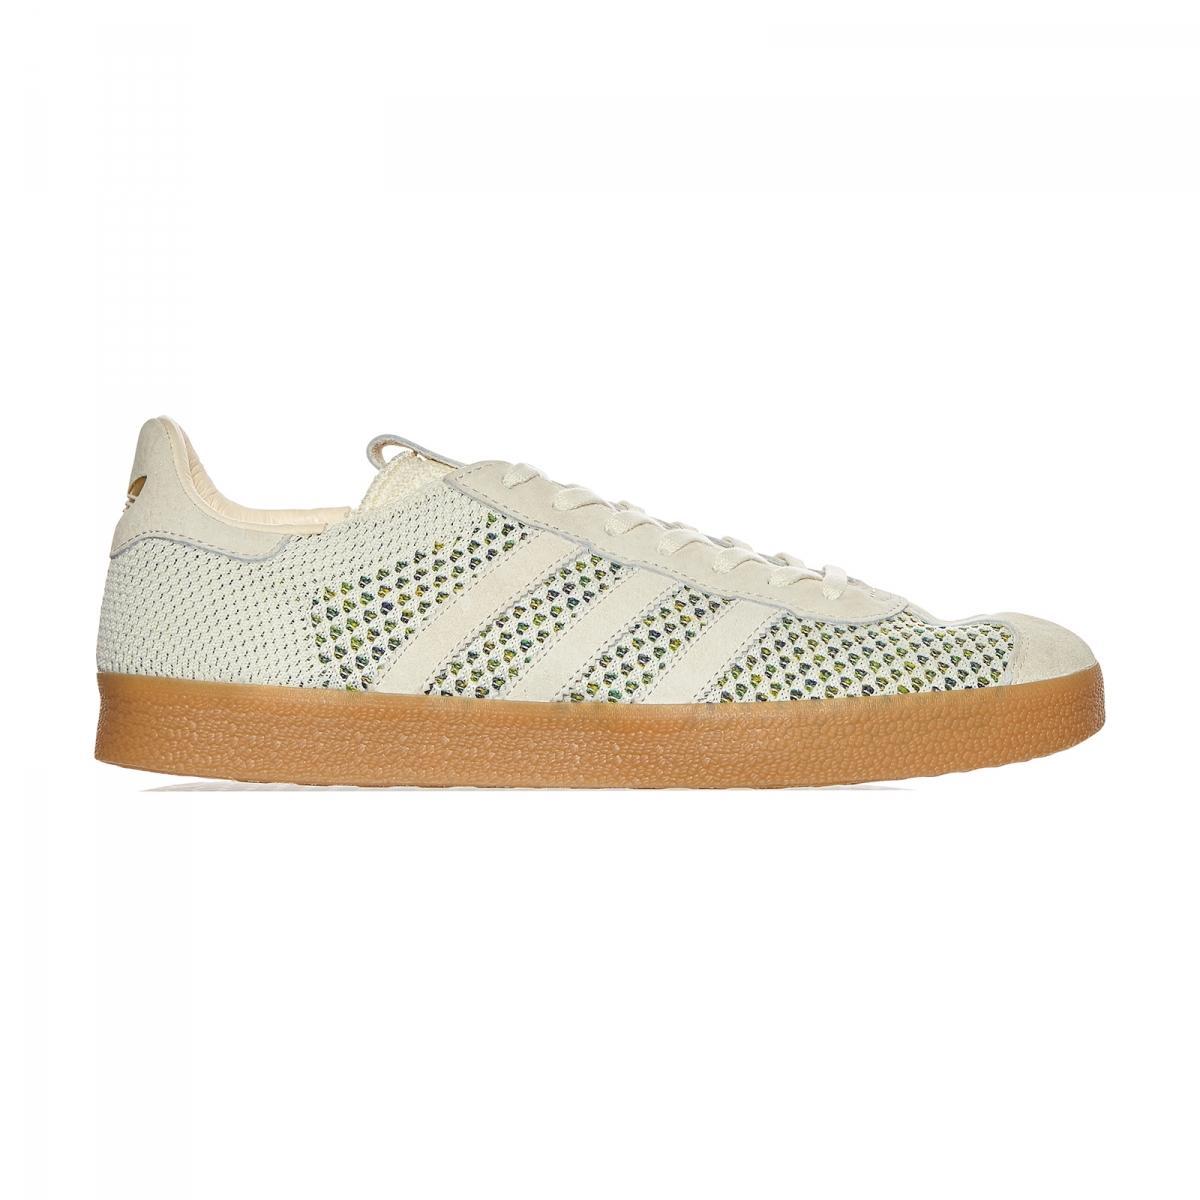 the latest 4c5d1 b8ed0 Lyst - Adidas Originals Politics X Gazelle Pk Sneakers in Na